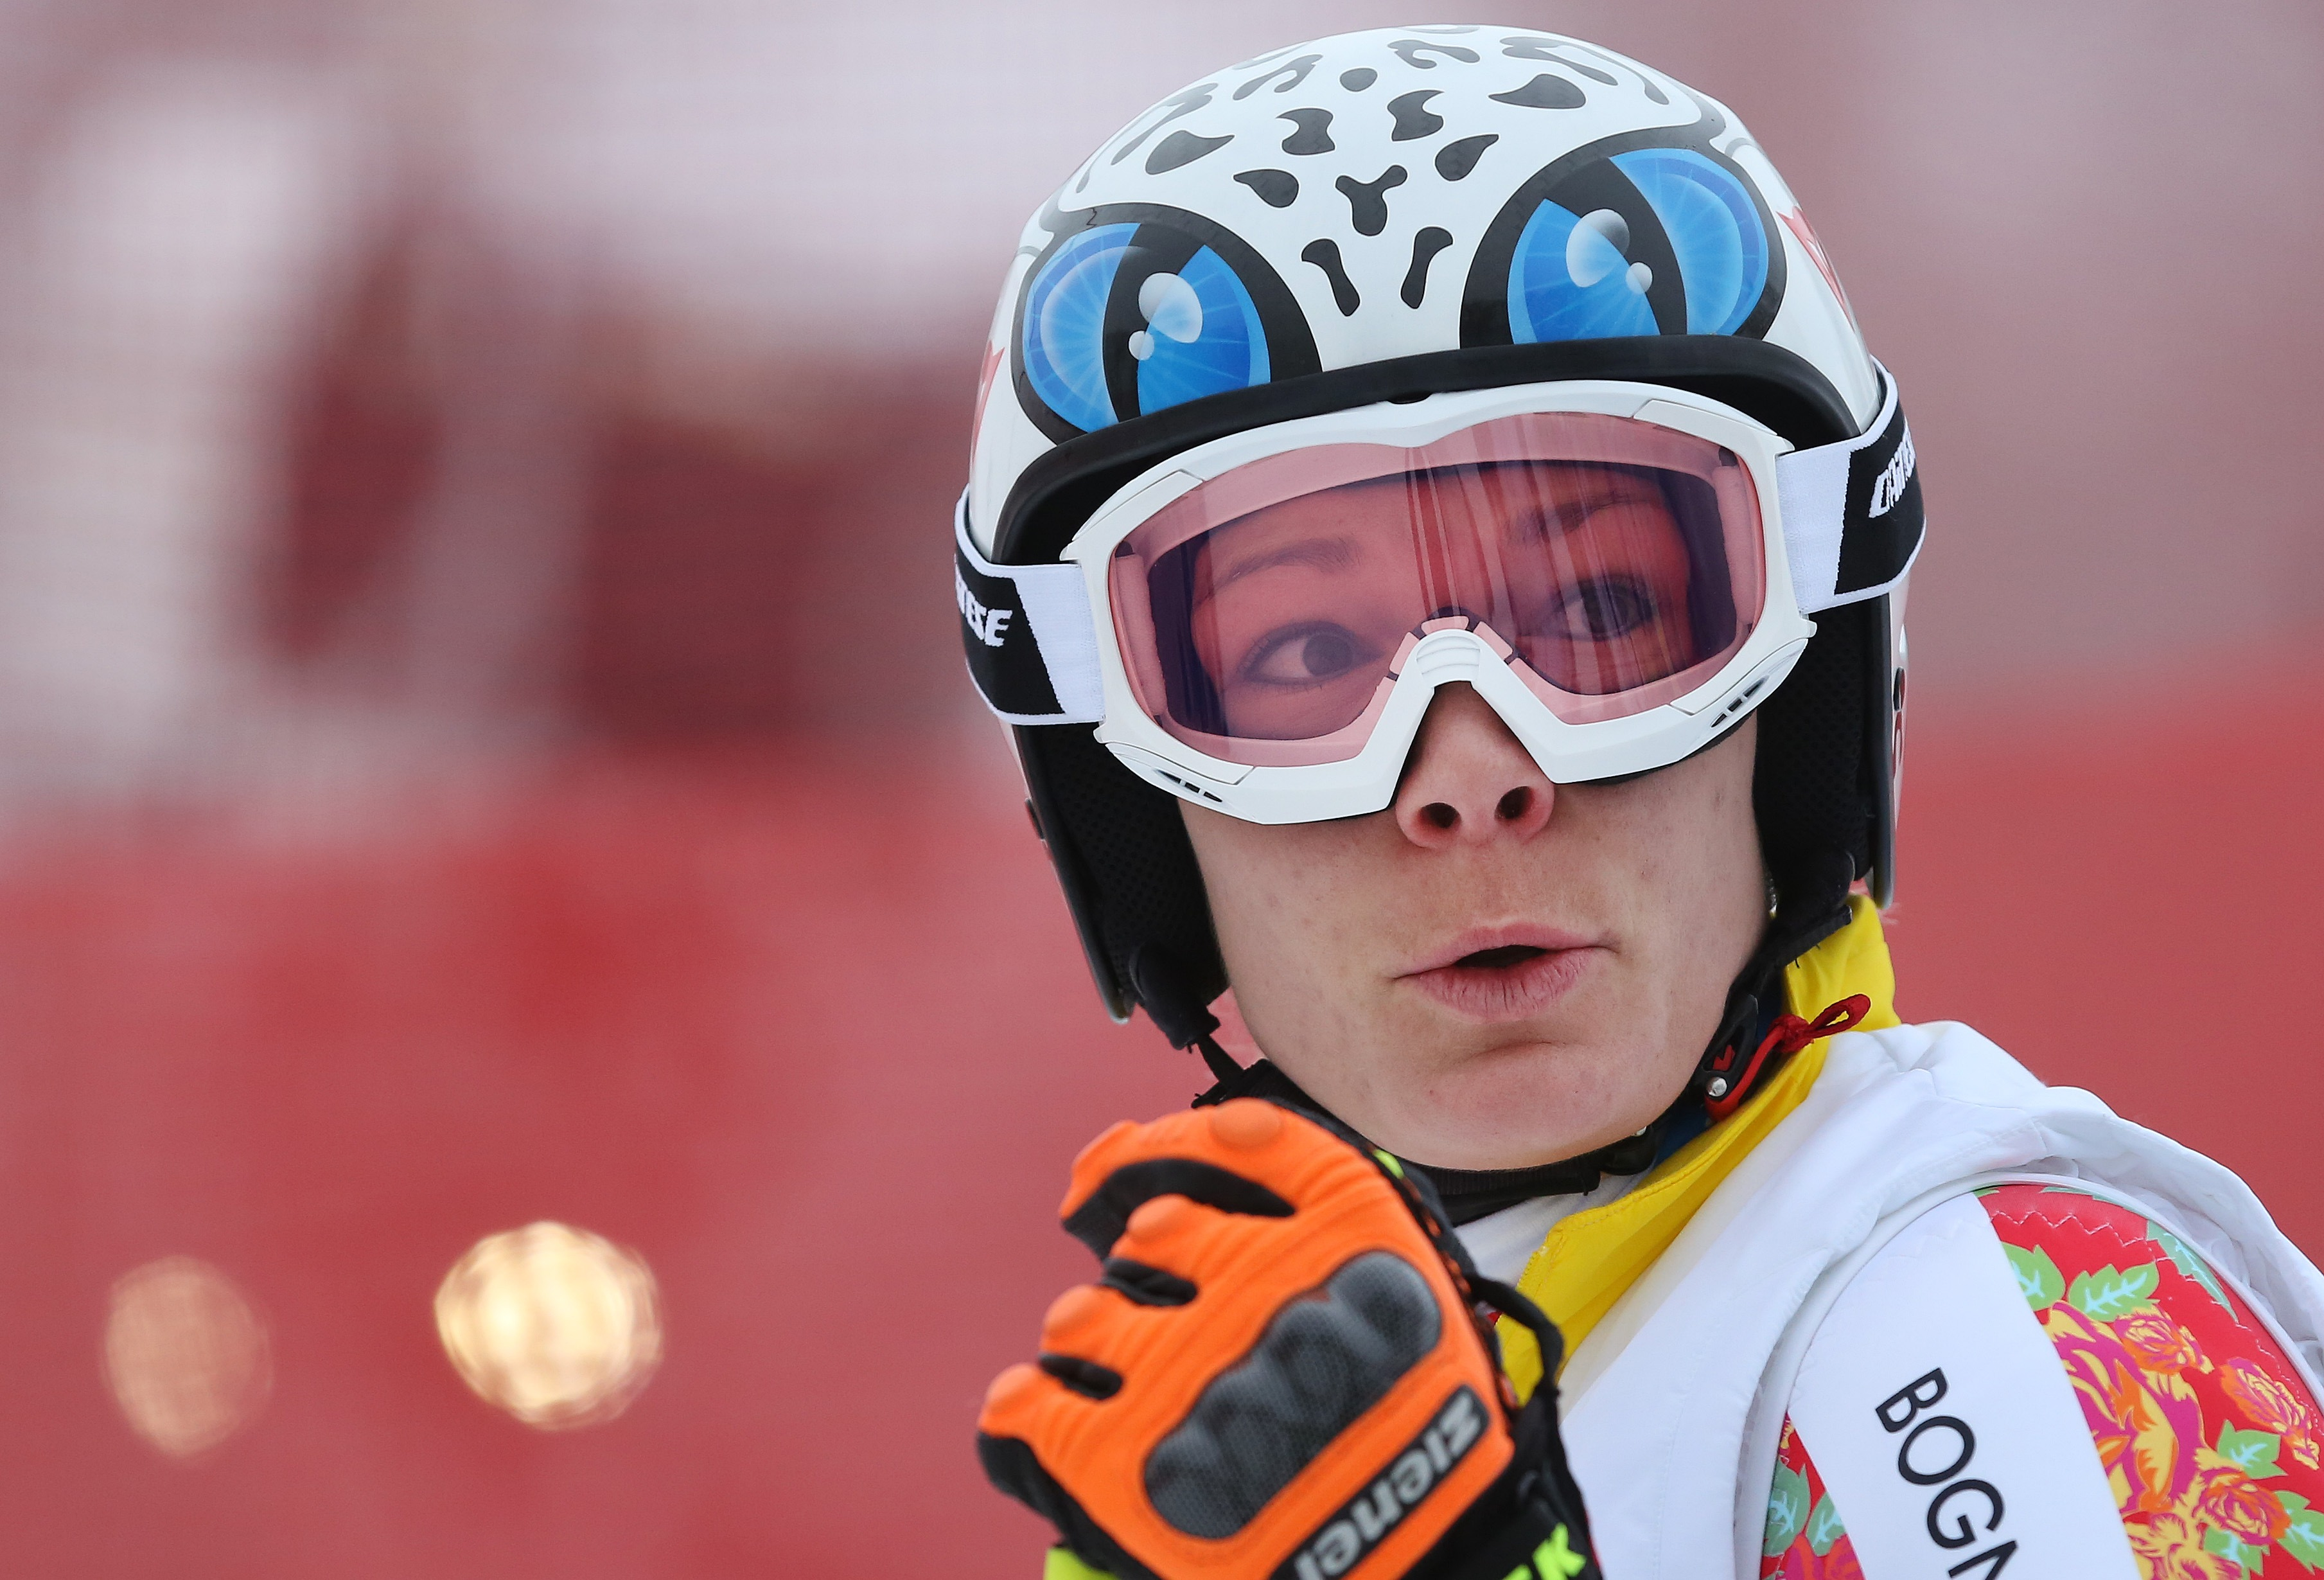 Germany's Maria Hoefl-Riesch stands on the alpine skiing training slopes at the Sochi 2014 Winter Olympics, Monday, Feb. 17, 2014, in Krasnaya Polyana, Russia. (AP Photo/Alessandro Trovati)